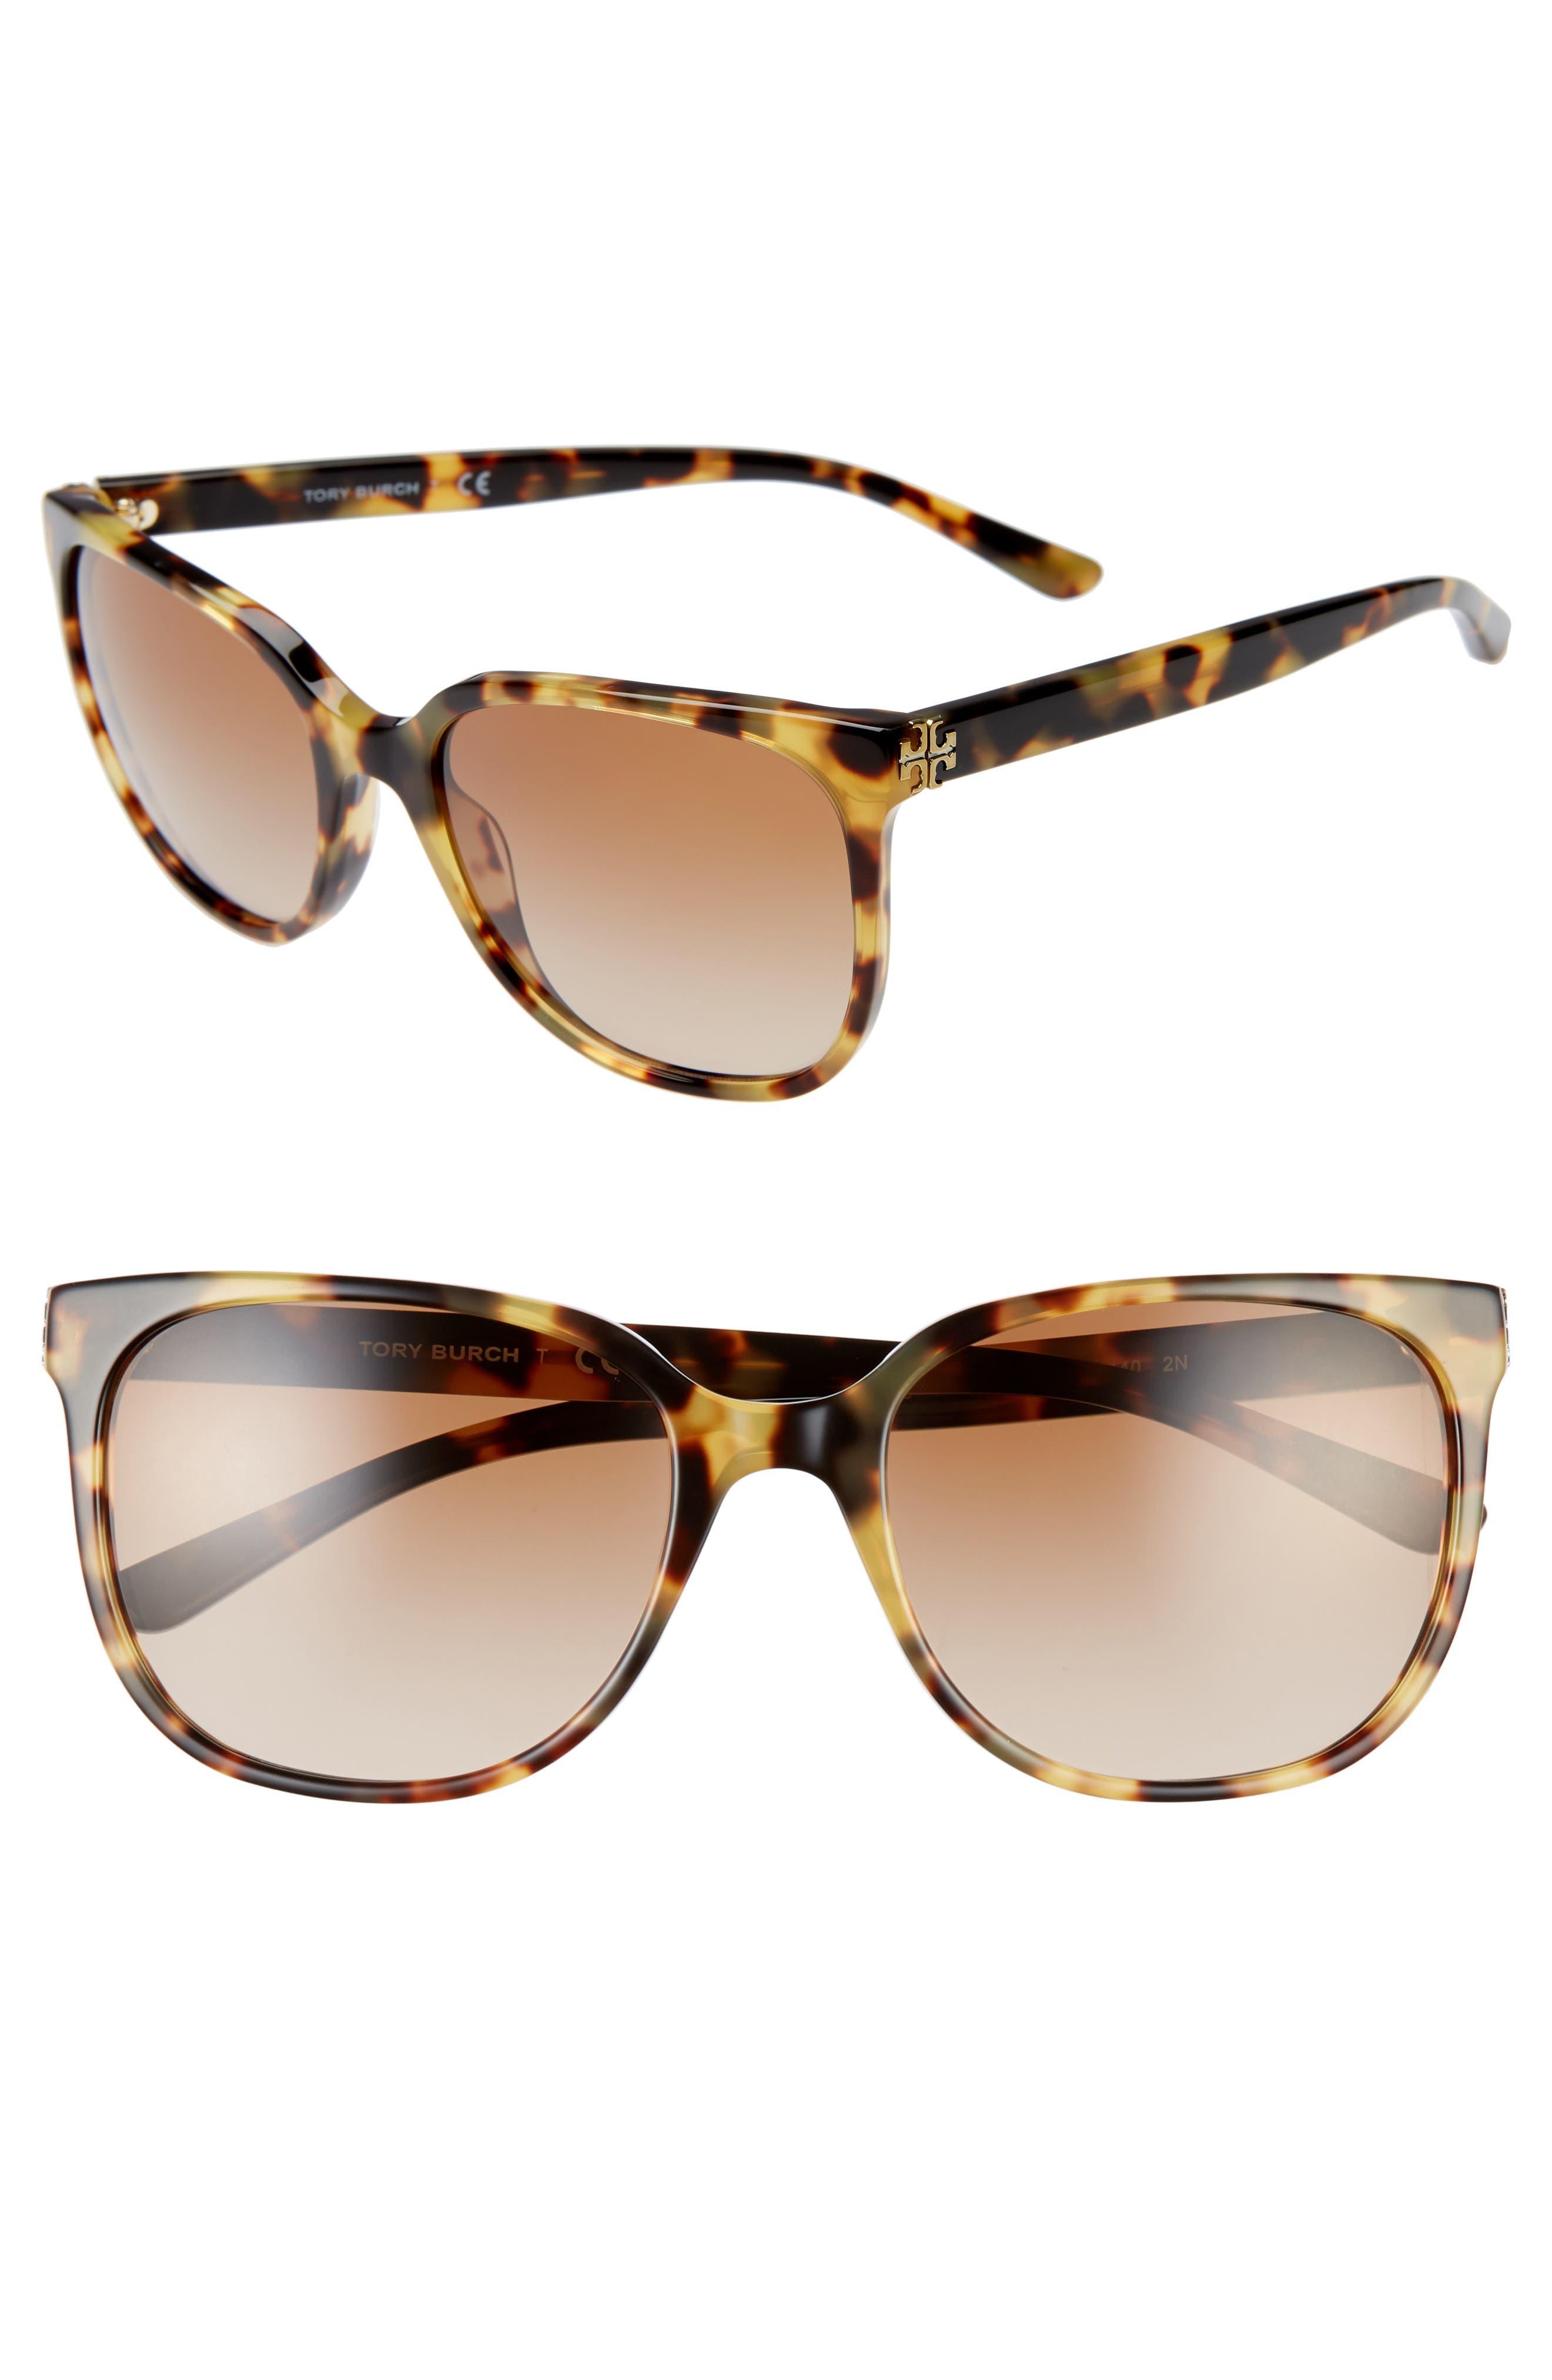 TORY BURCH, 57mm Gradient Sunglasses, Main thumbnail 1, color, 205